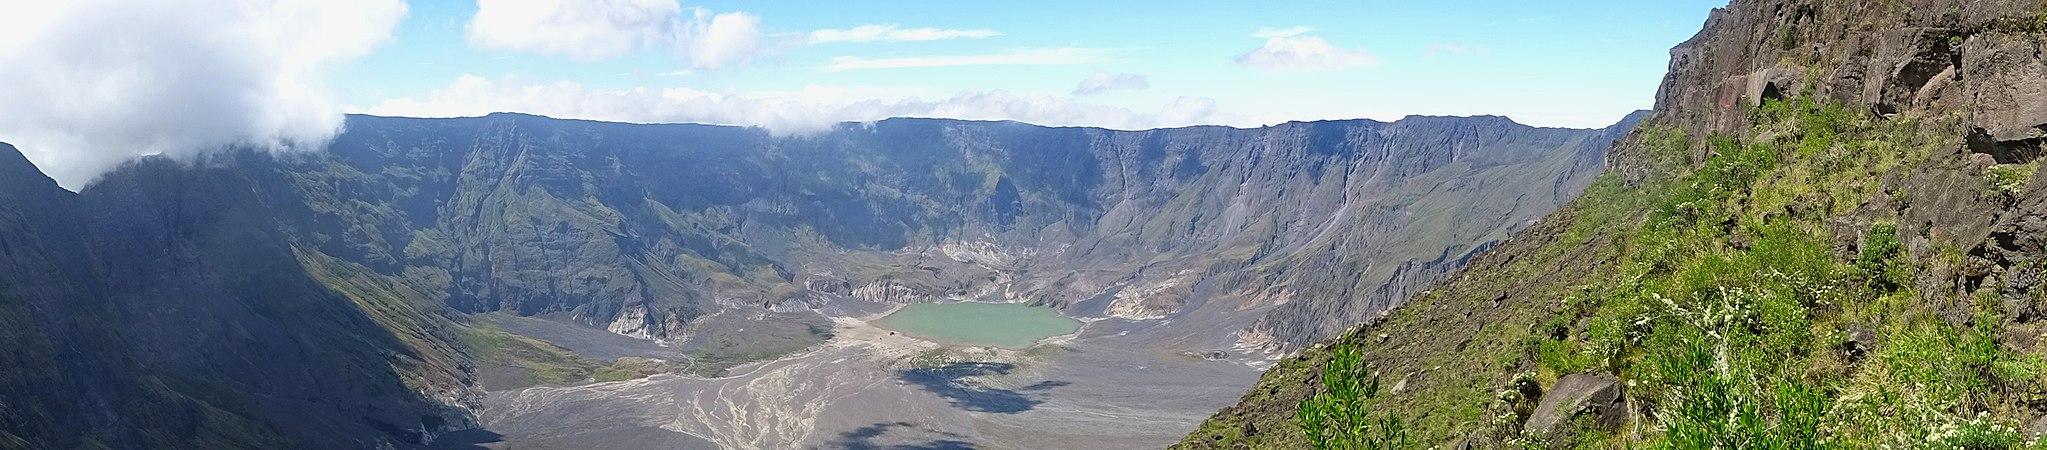 Panorama Mount Tambora caldera.jpg